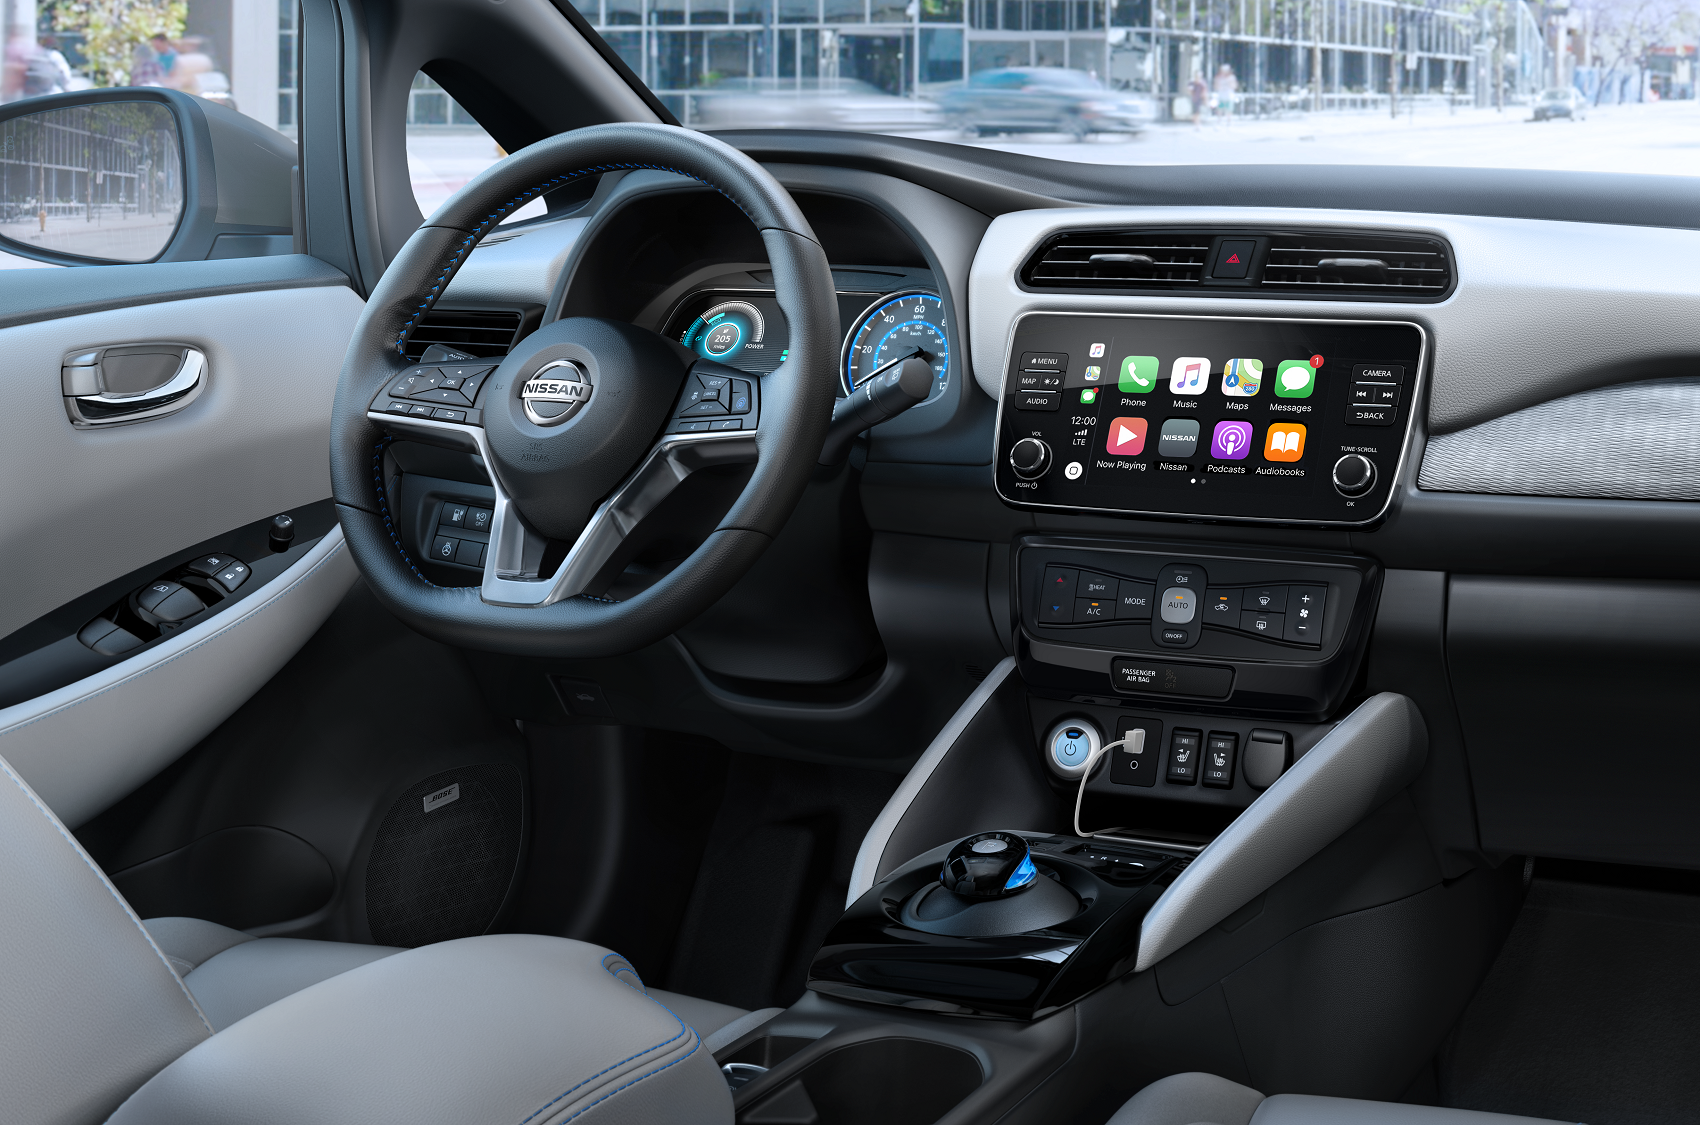 2019 Nissan LEAF Interior Technology